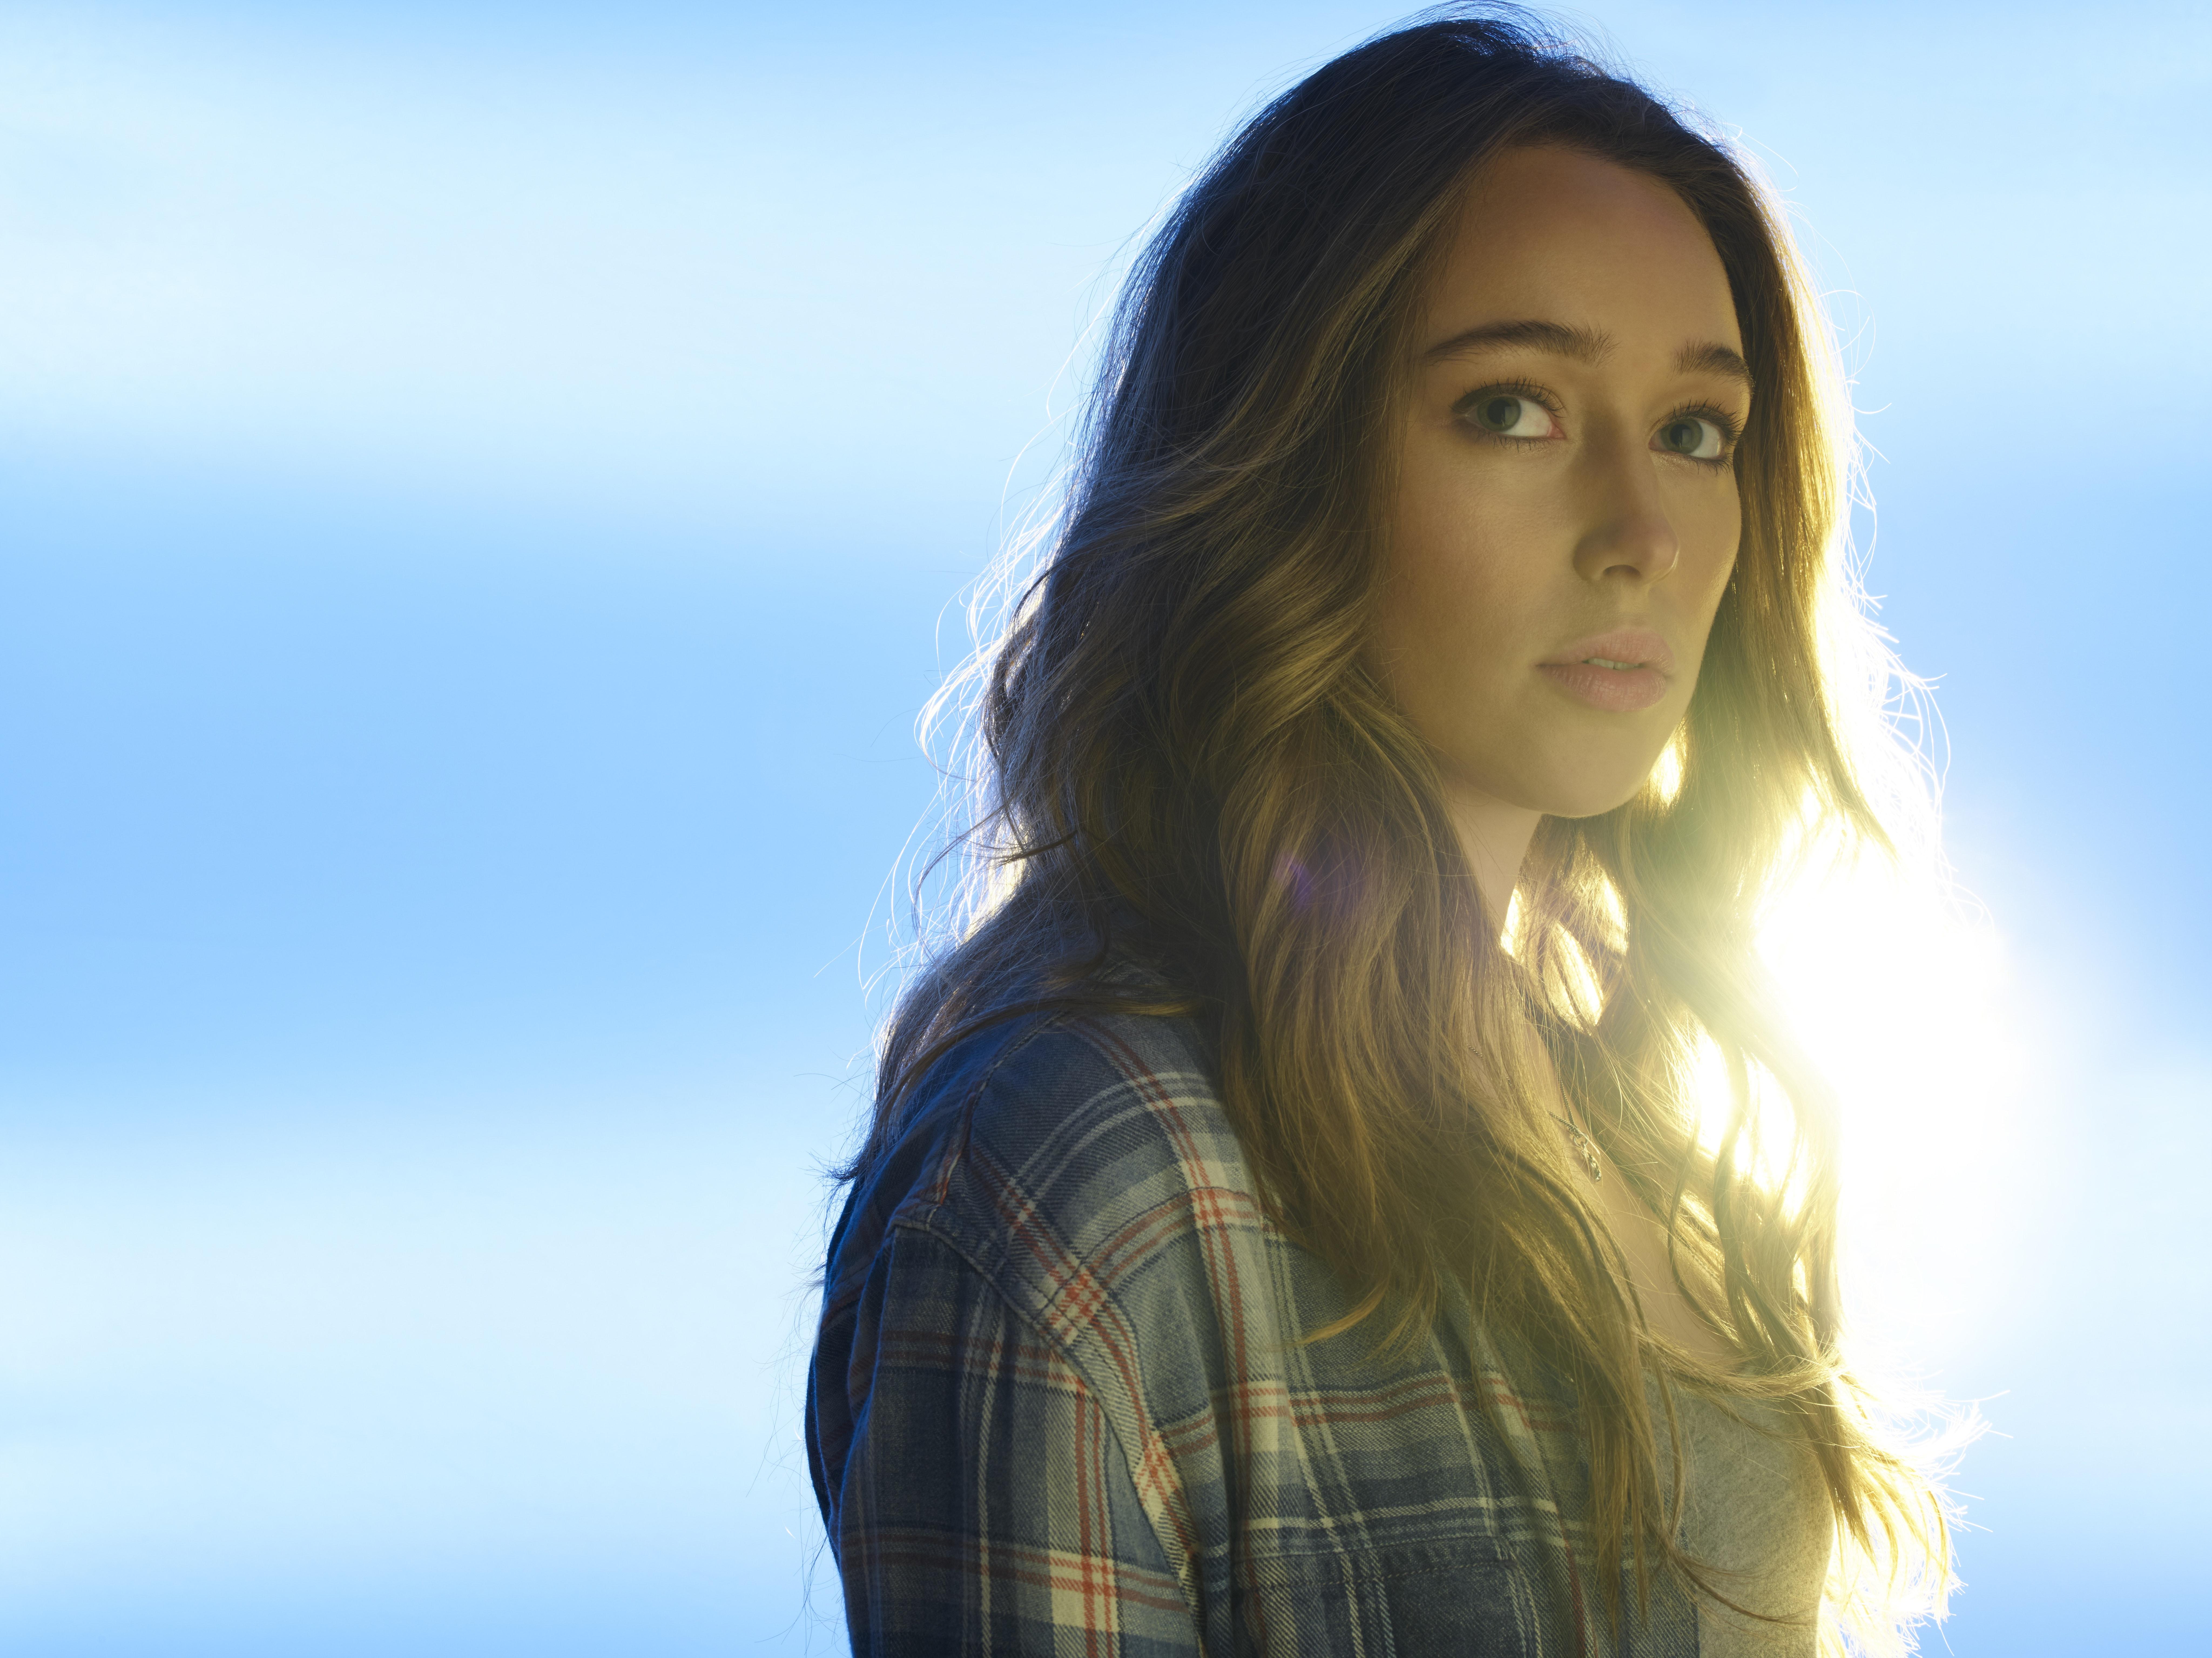 What Needs to Happen in 'Fear the Walking Dead' When Season 2 Resumes